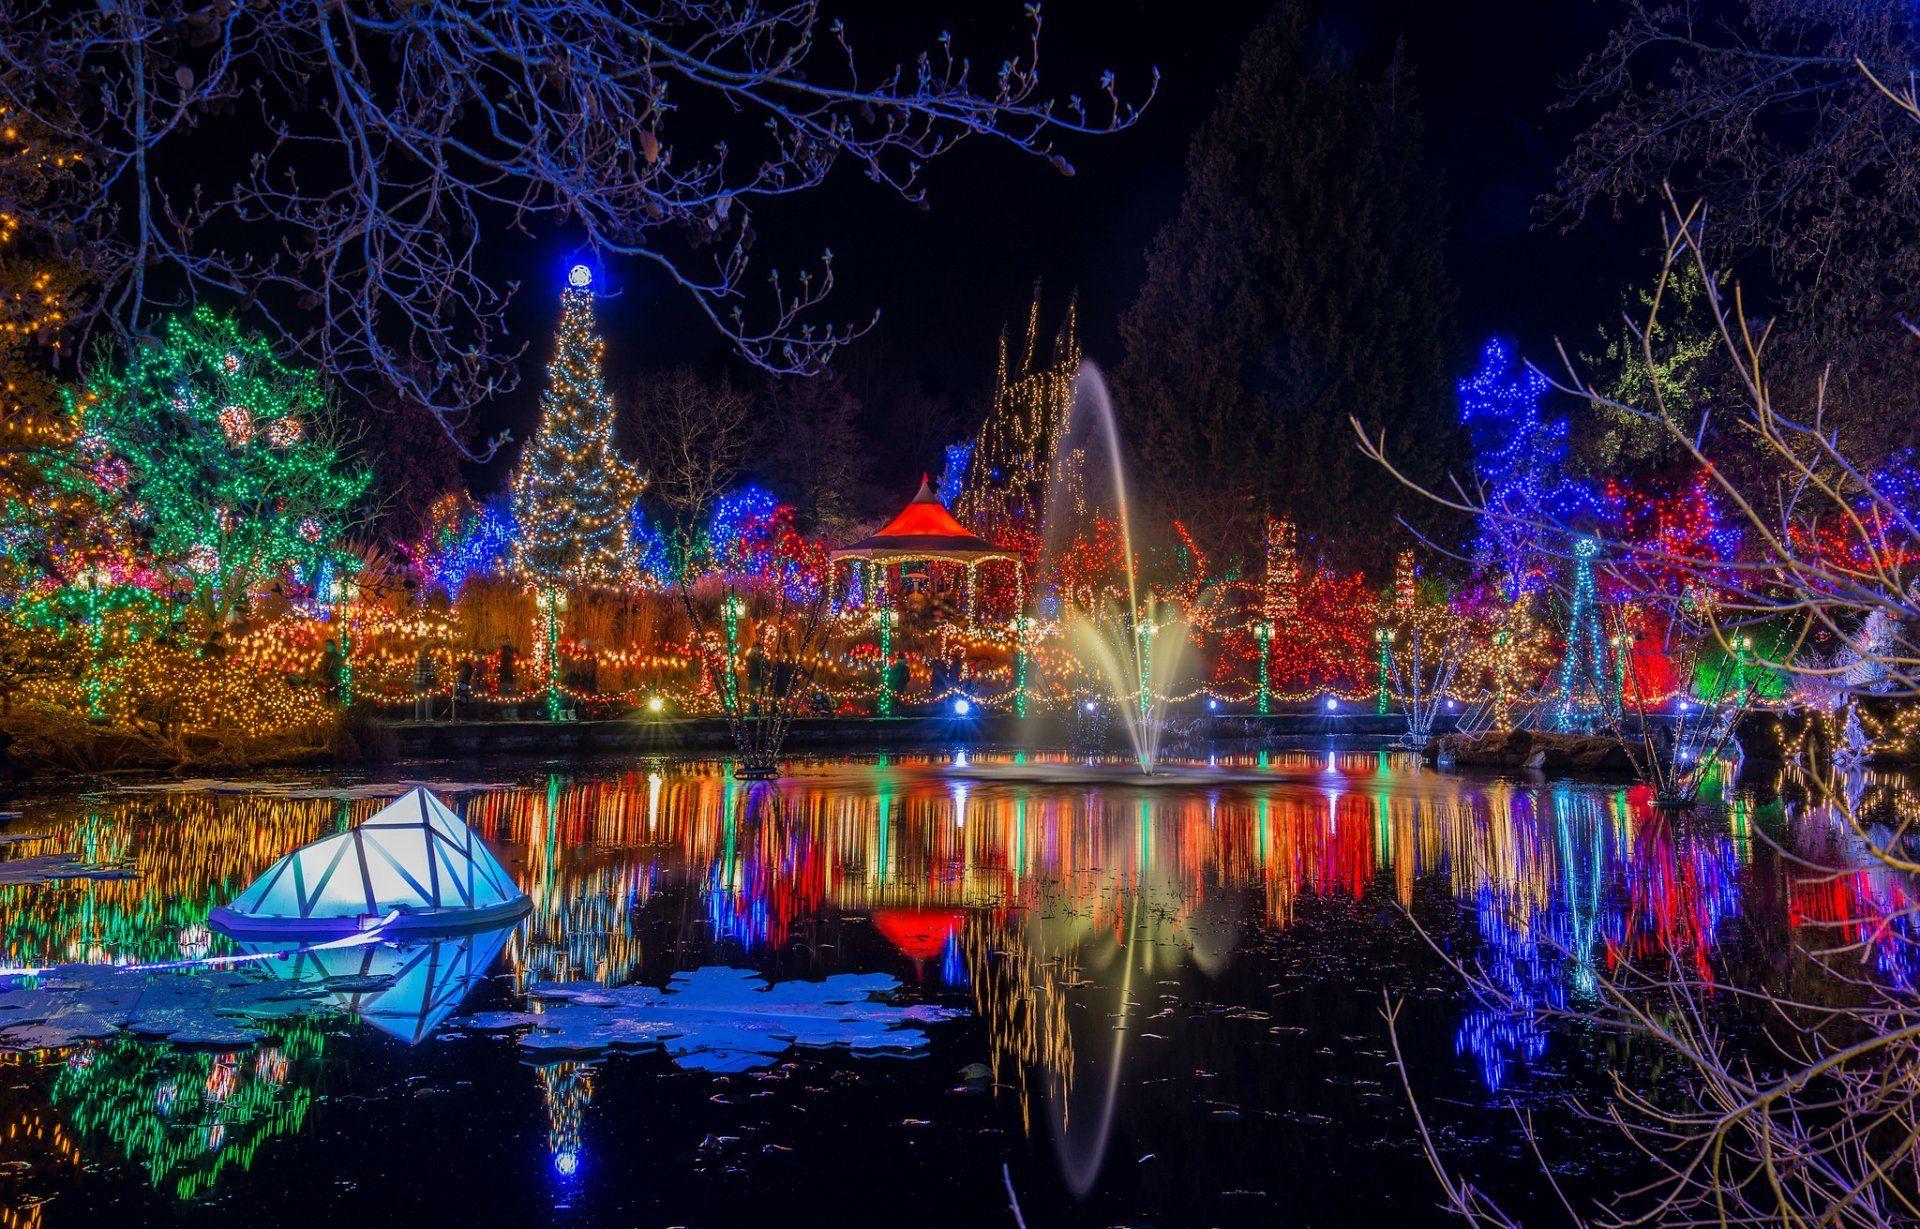 Related Image Best Christmas Light Displays Holiday Lights Christmas Lights